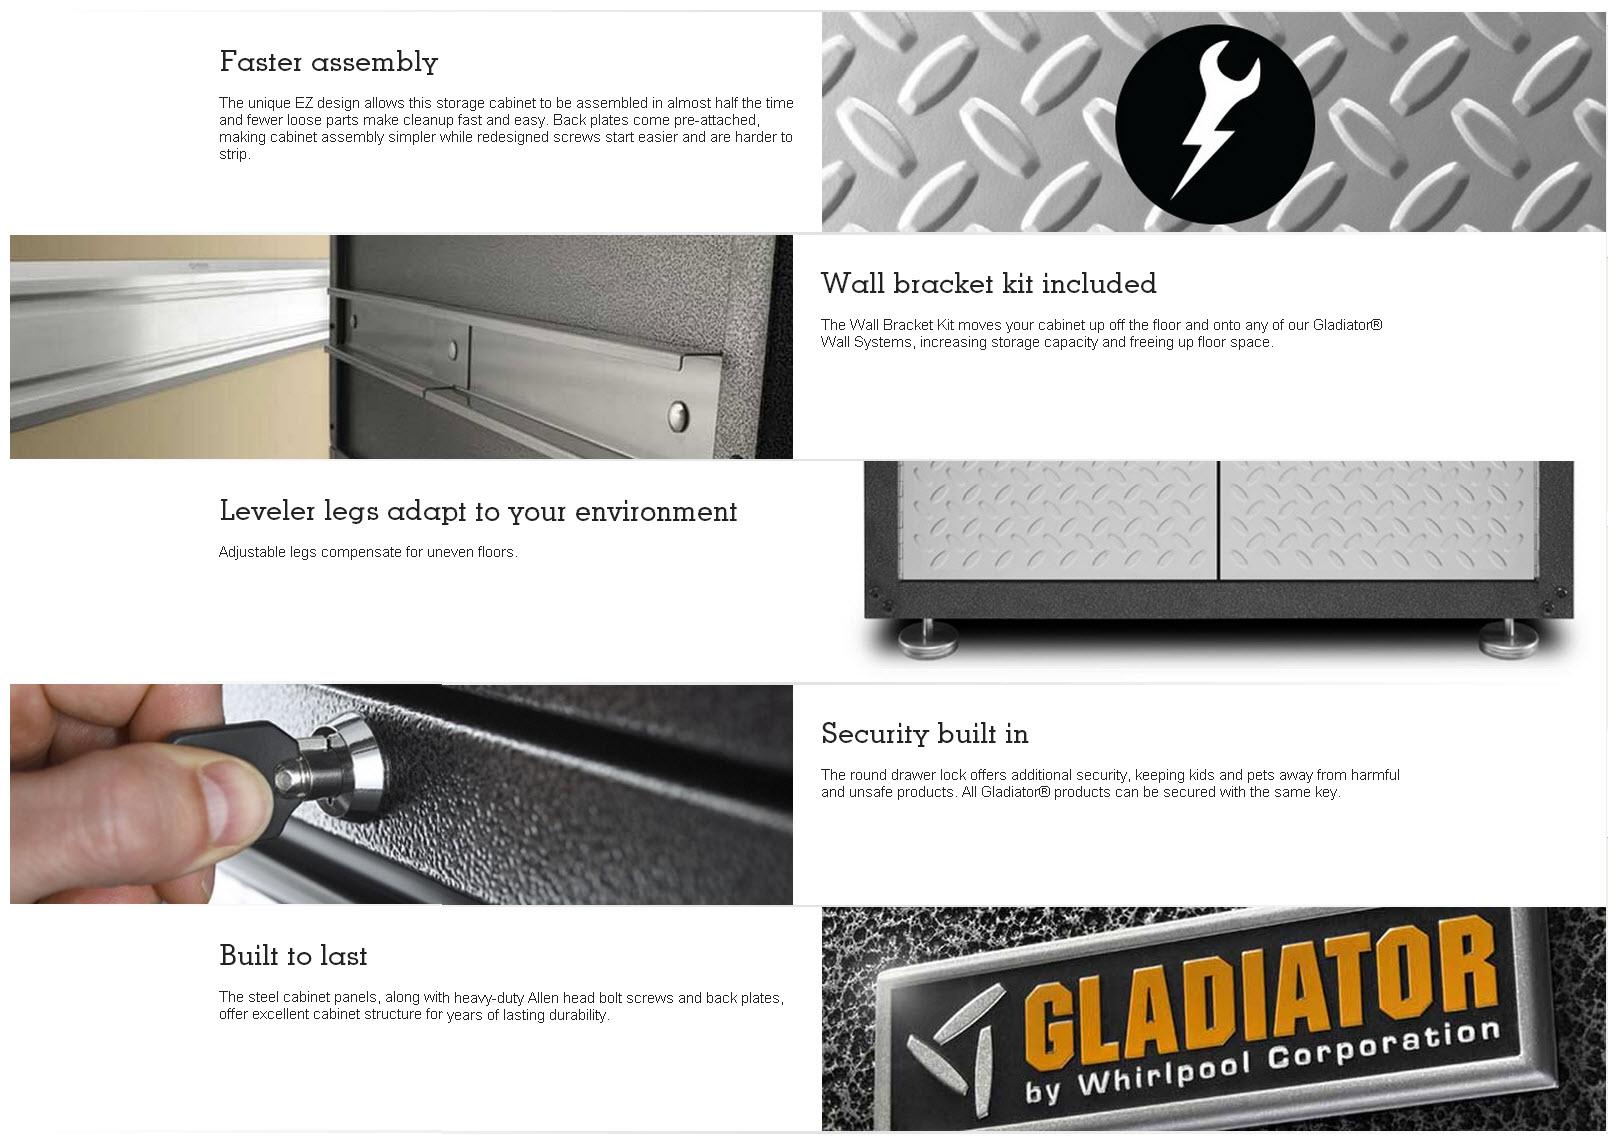 Gladiator Jumbo GearBox Pro Tool Storage from Sears